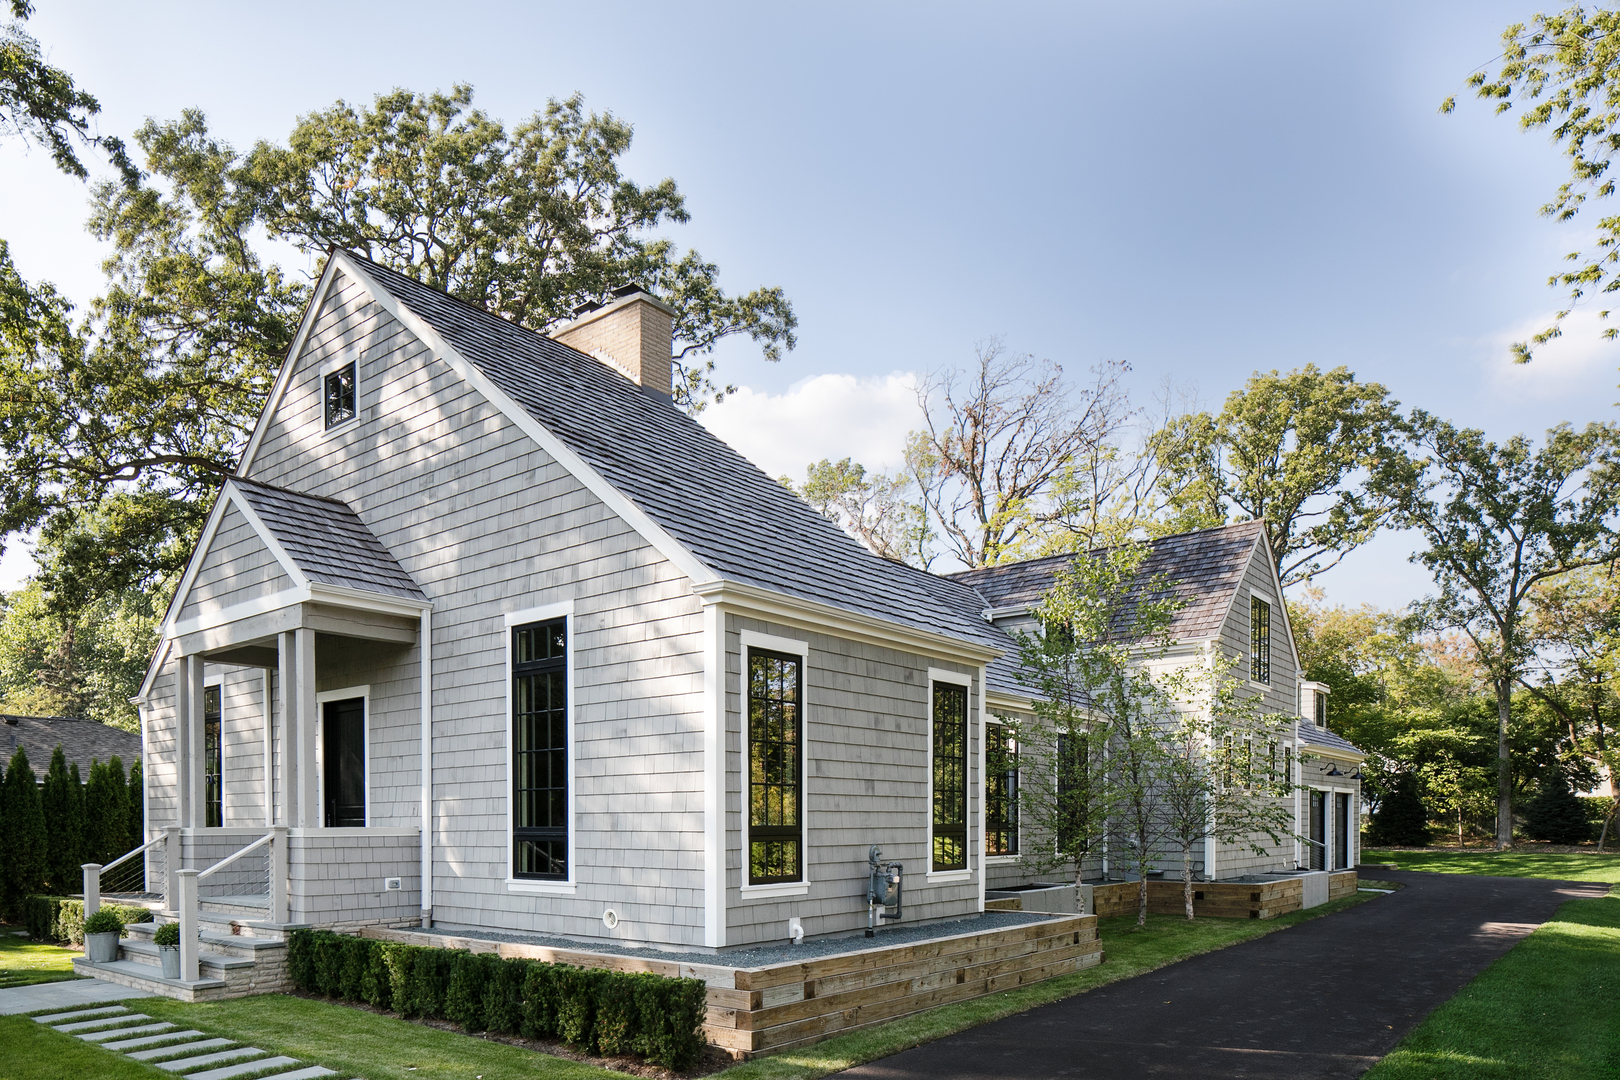 Casa Unifamiliar por un Venta en 700 Green Briar Lane 700 Green Briar Lane Lake Forest, Illinois,60045 Estados Unidos